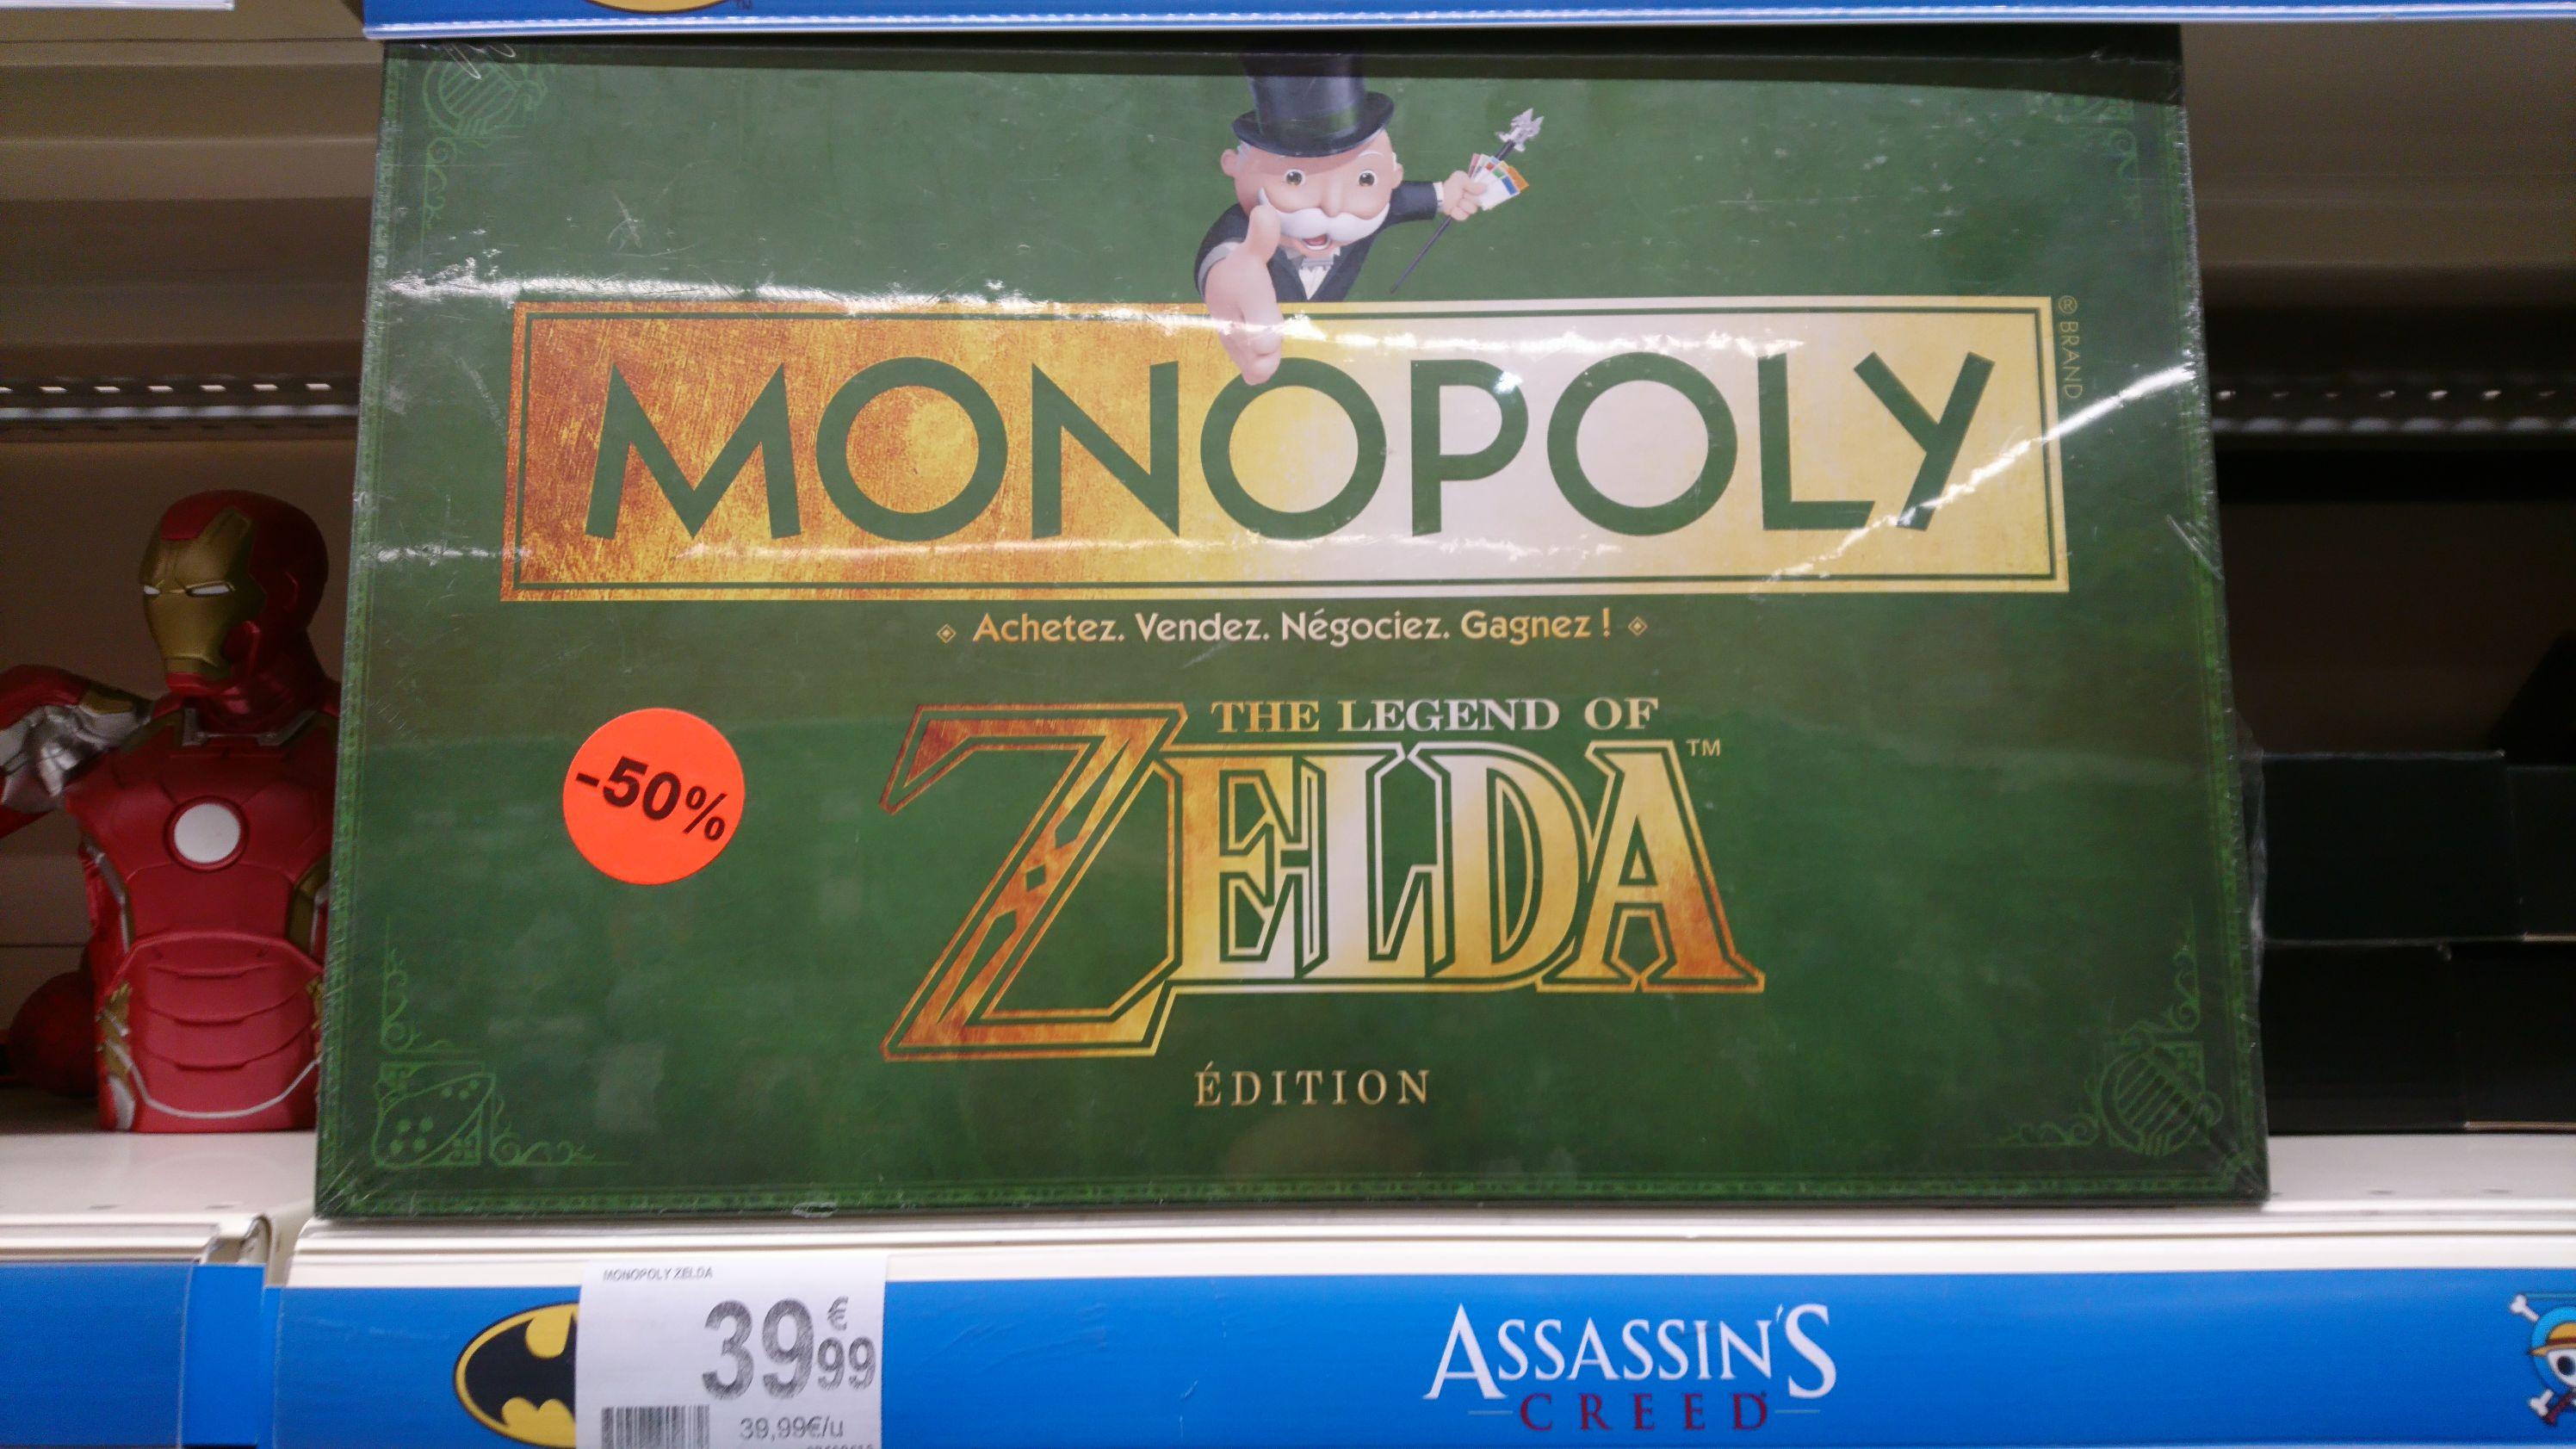 Monopoly Zelda - Saint-quentin (02)